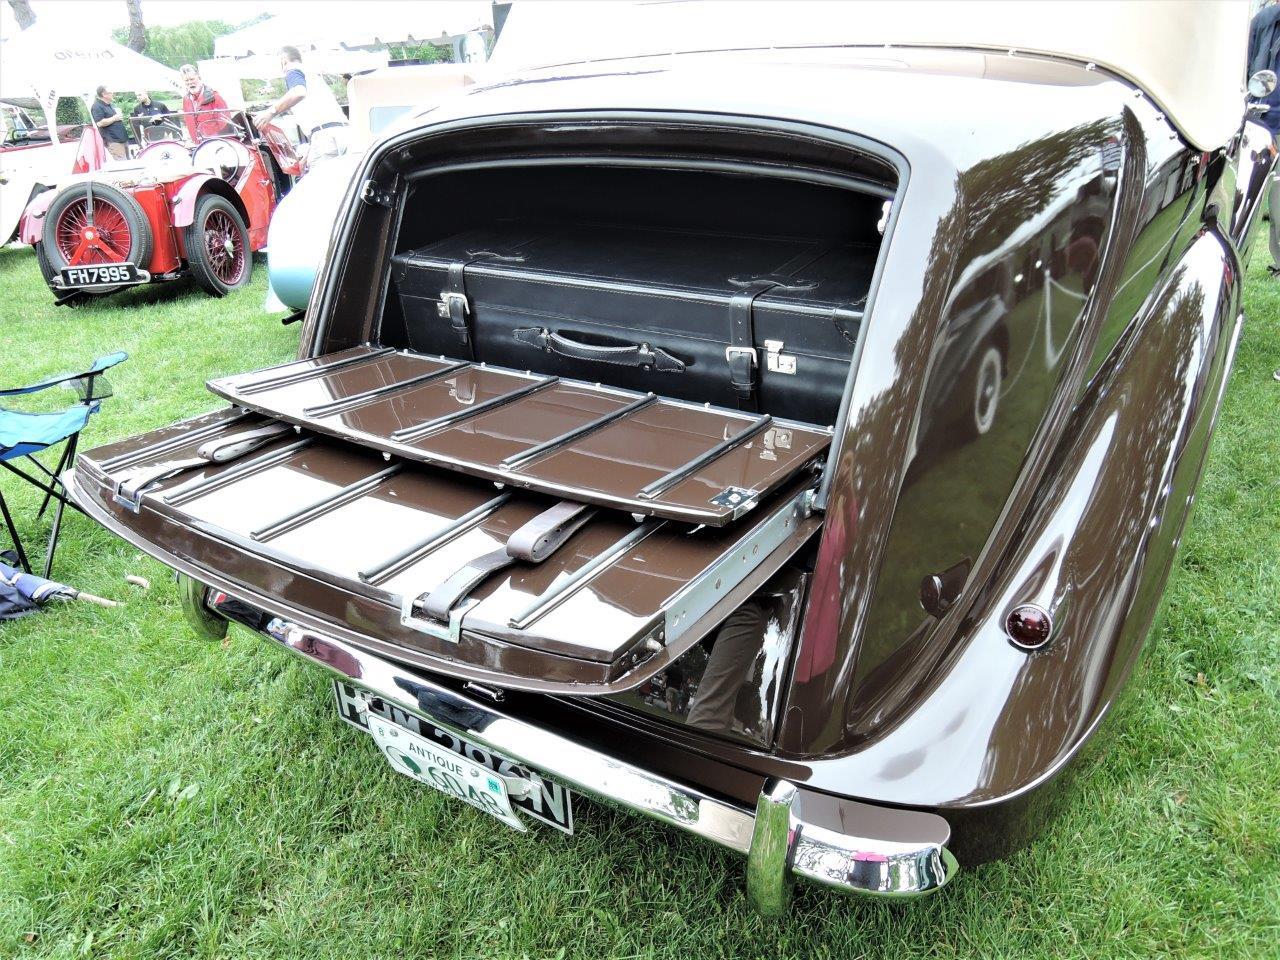 tan/brown 1947 Rolls-Royce Silver Wraith  - 2018 Greenwich Concours International